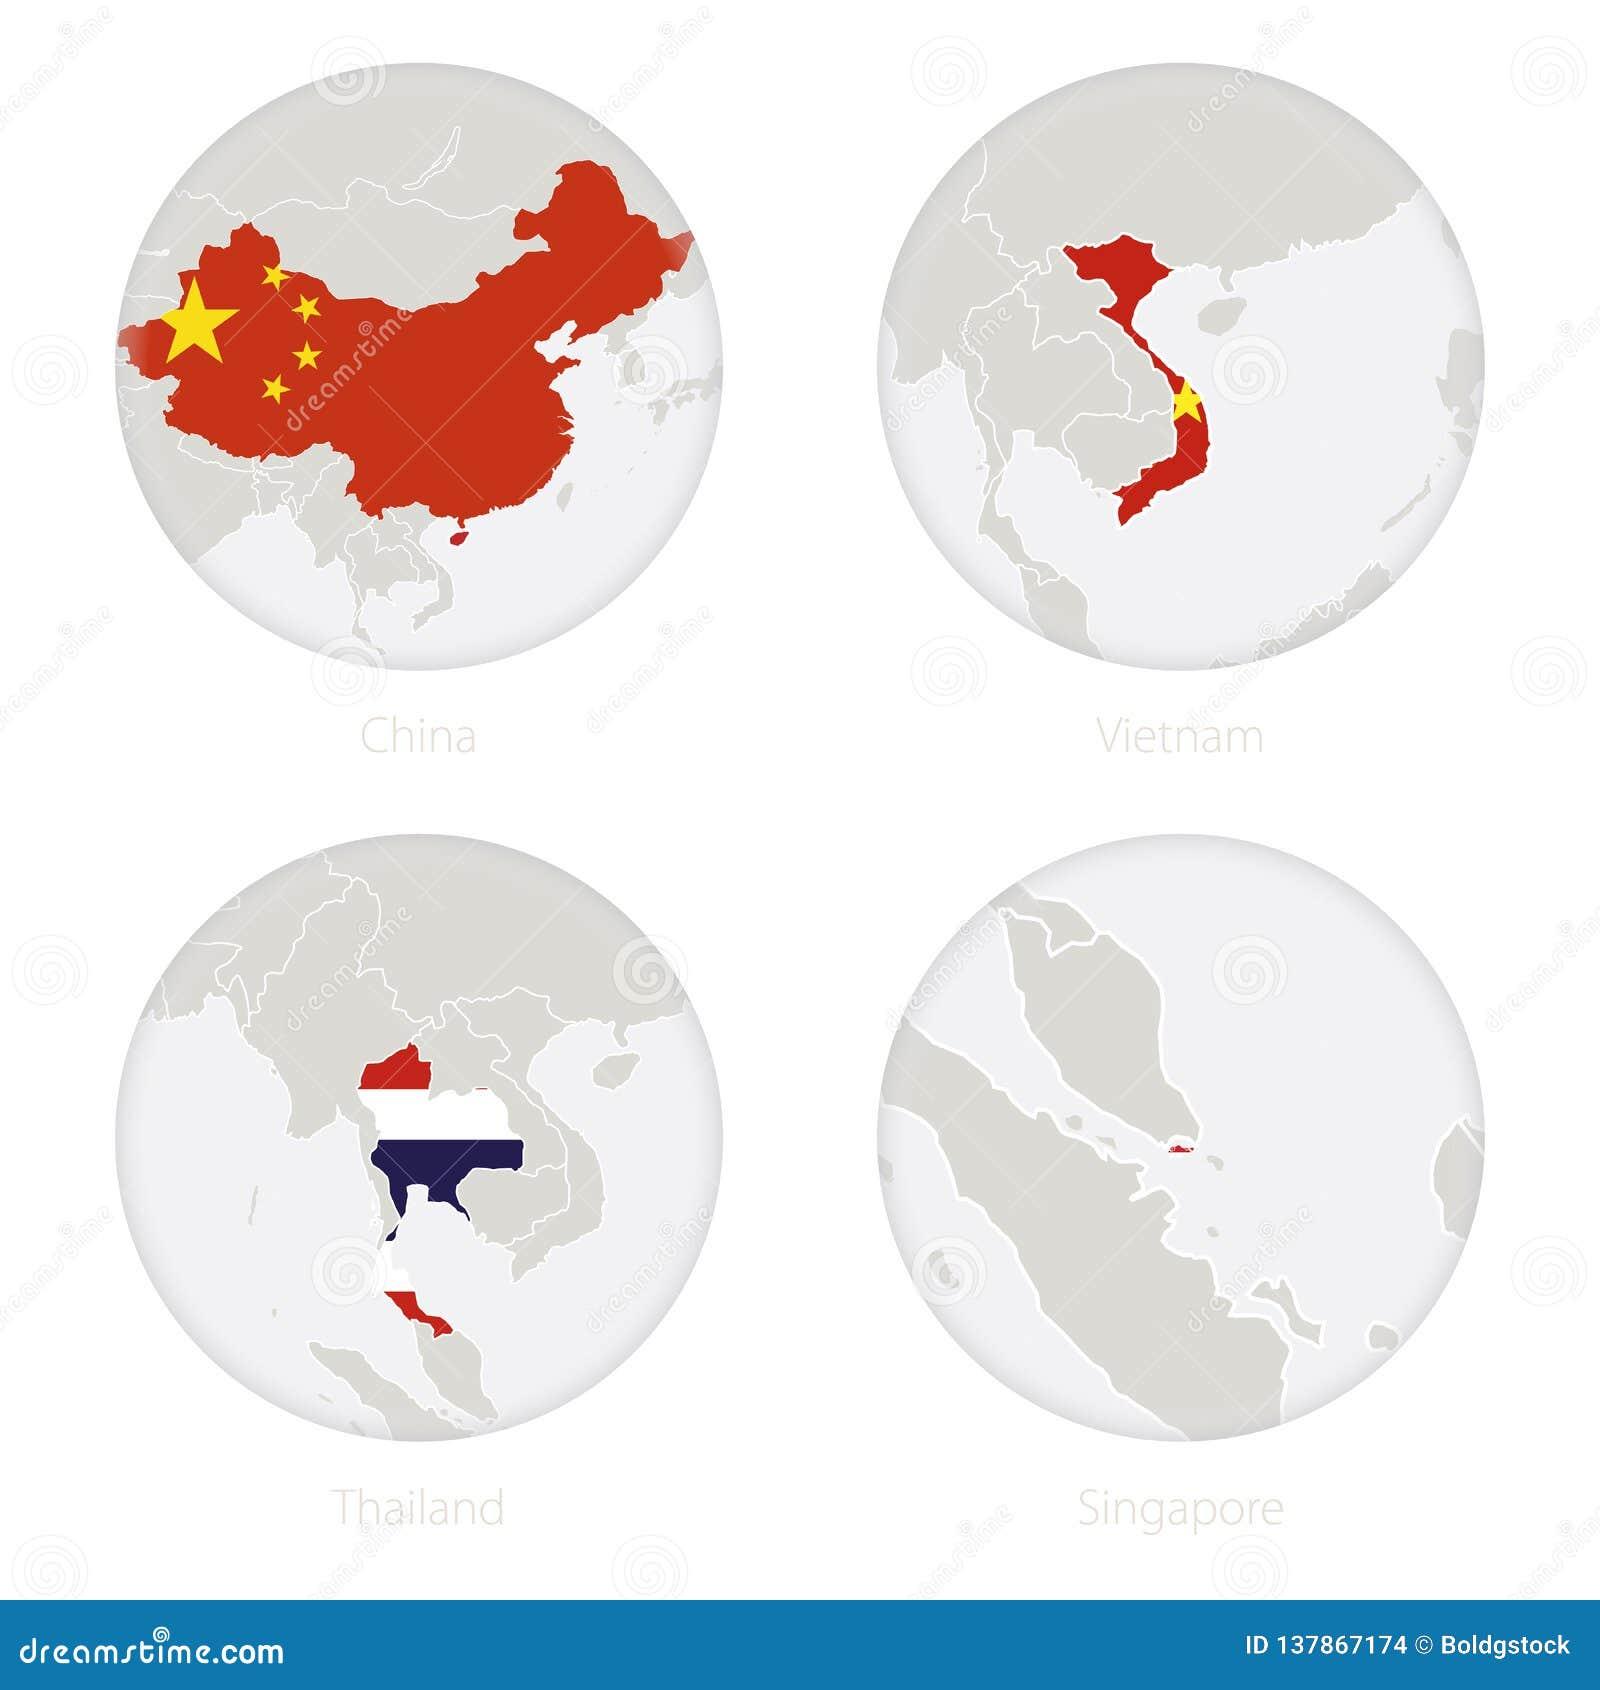 China, Vietnam, Thailand, Singapore Map Contour And National ... on vietnam flag borders, south korea map, vietnam tour, indonesia map, vietnam travel guide, indochina map, vietnam border 17 feb 1979, vietnam forest, east asia map, vietnamese map, southeast asia map, austria and czech republic map, swaziland map, vietnam war, vietnam t-55 tank, vietnam dog trade, us mexico border fence map, malaysia map, argentina map, da nang map,